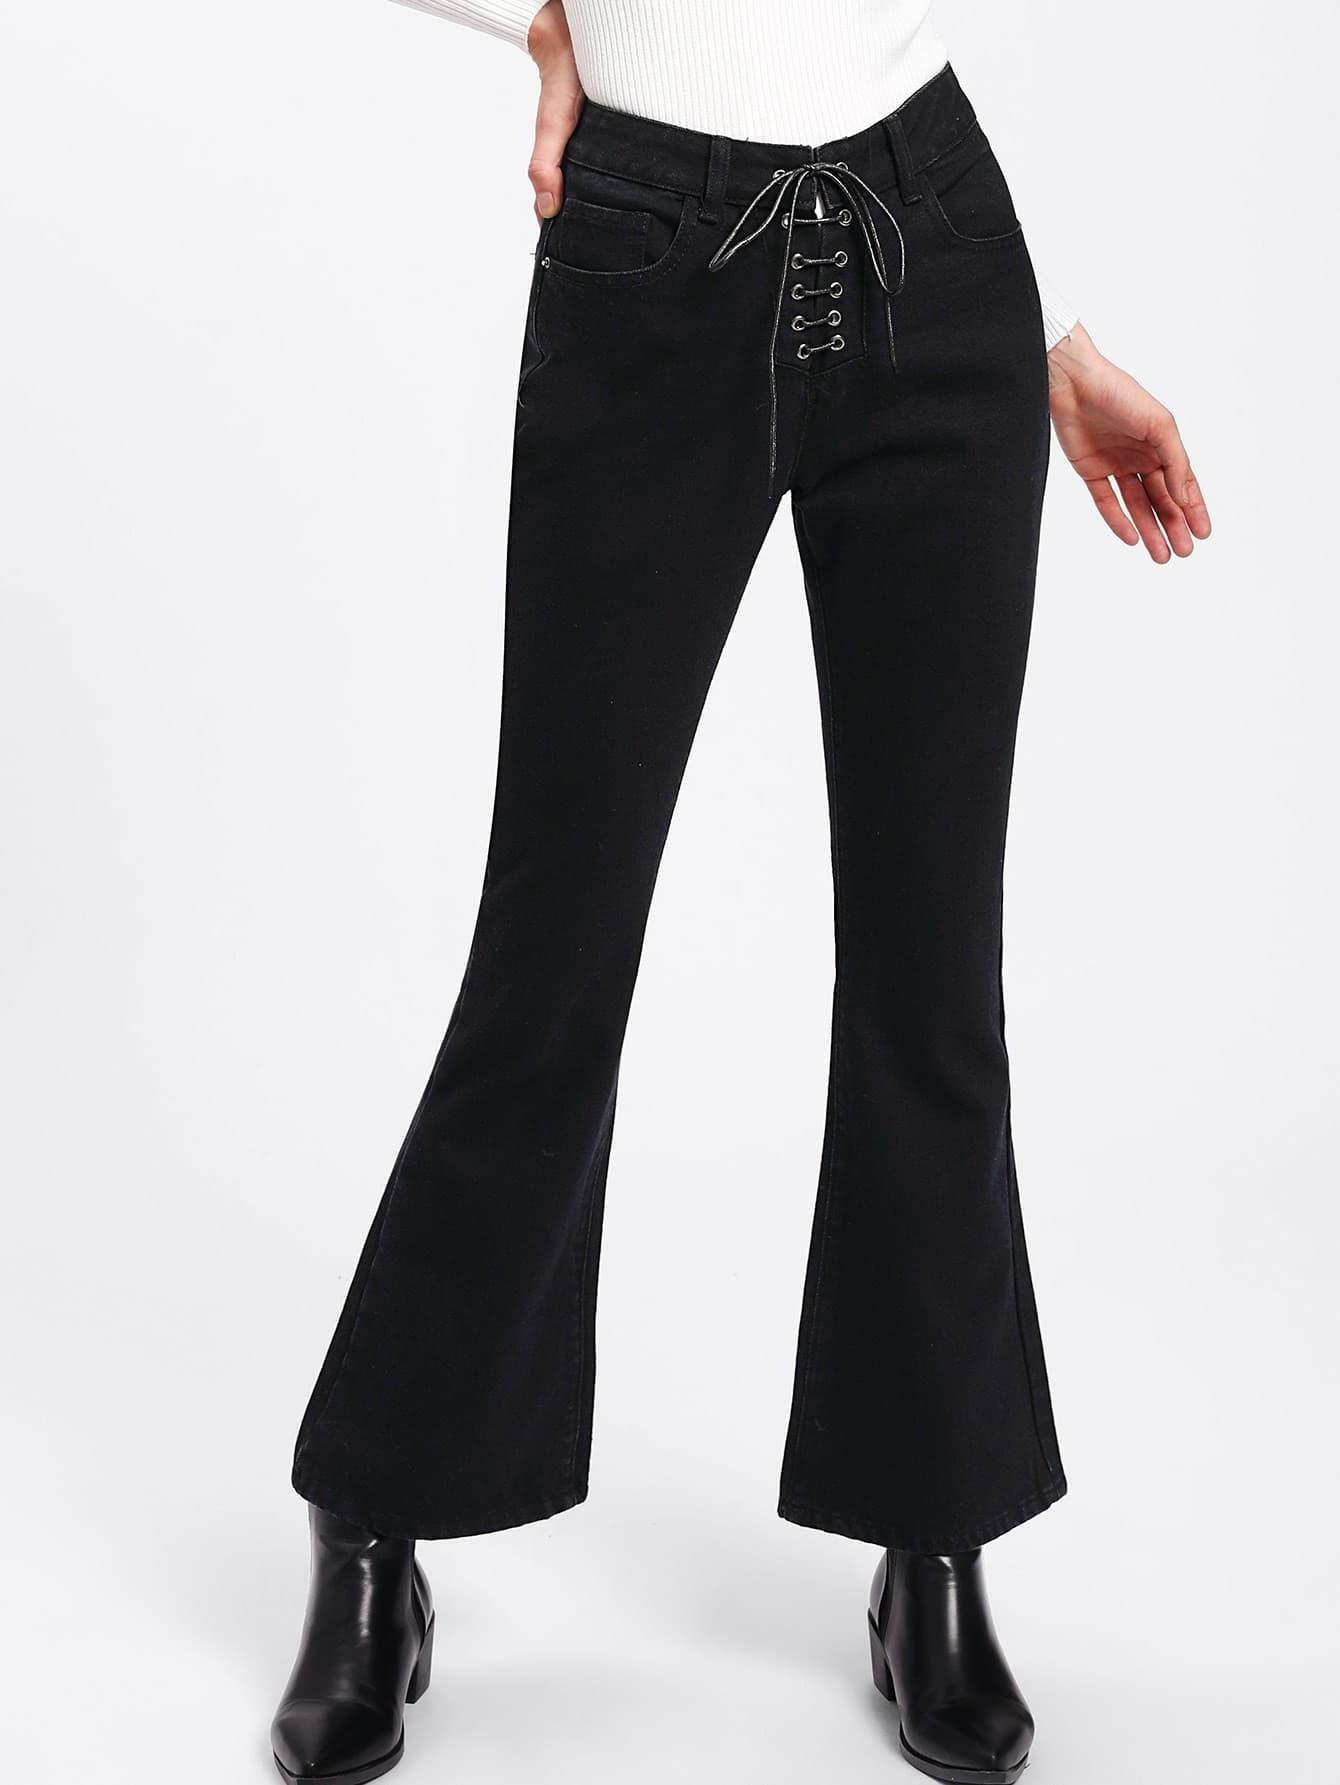 Grommet Lace Up Flared Hem Jeans